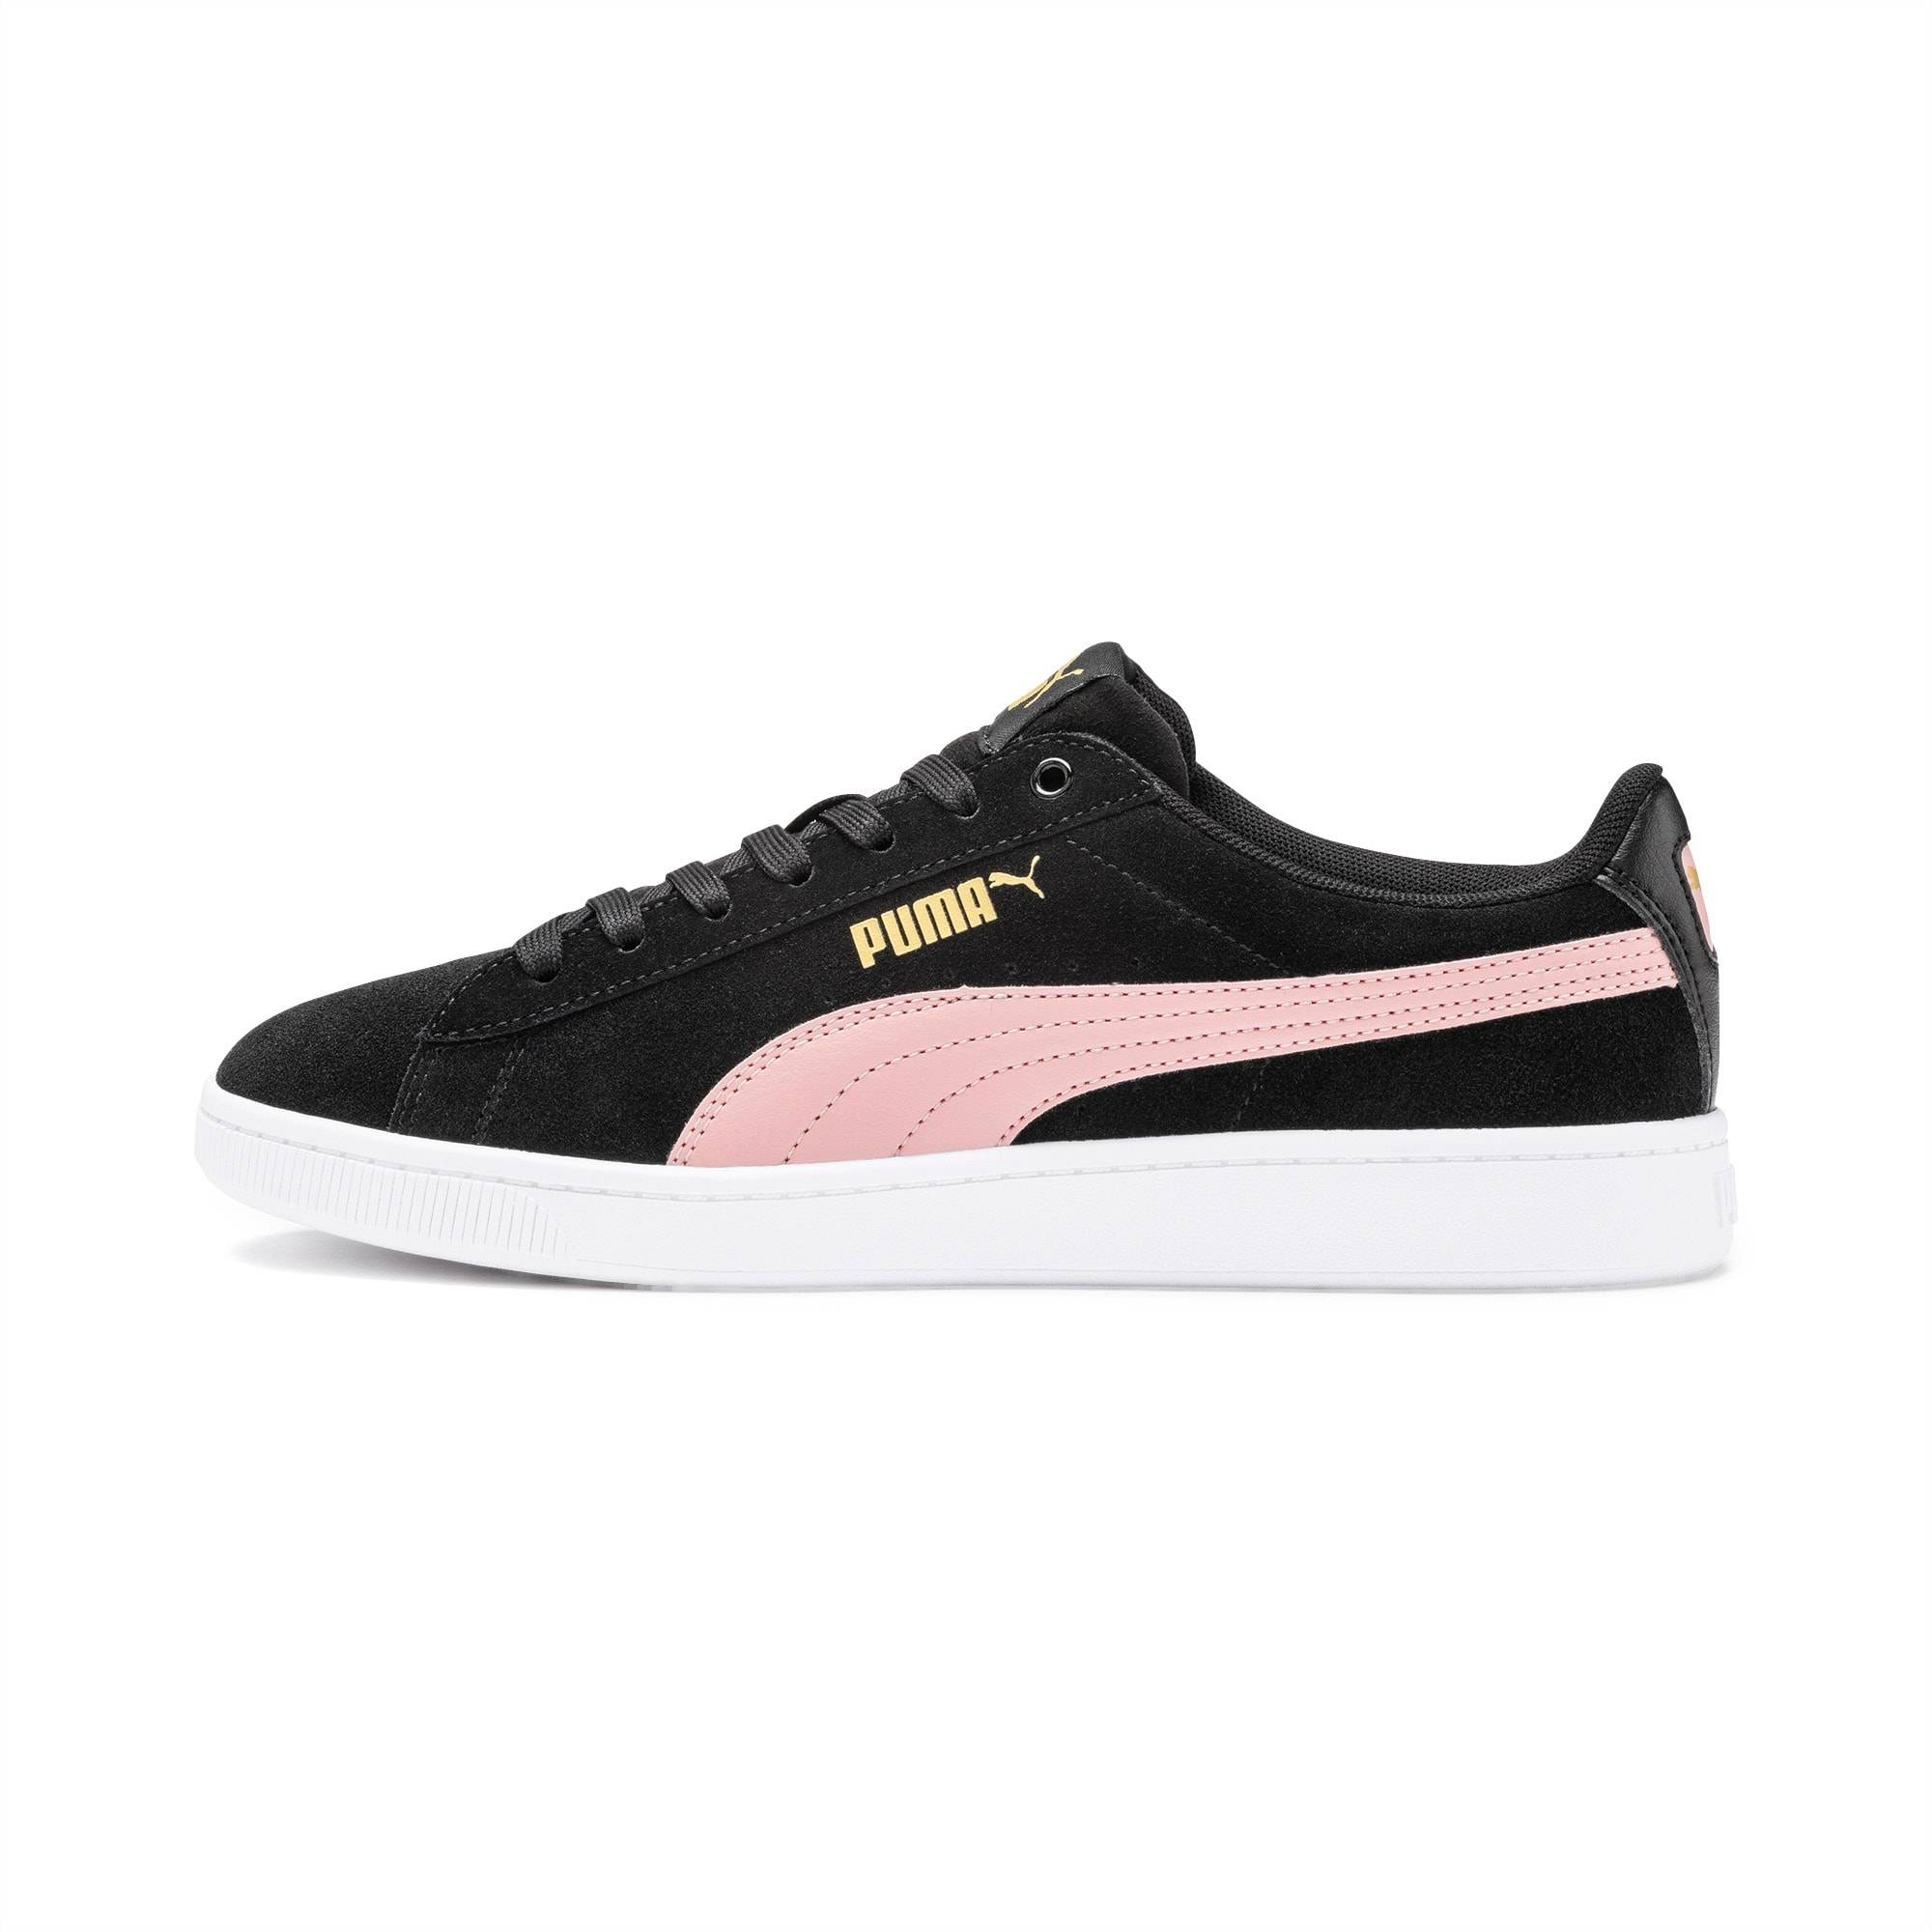 PUMA Chaussure Basket Vikky v2 pour Femme, Blanc/Rose/Noir, Taille 40.5, Chaussures